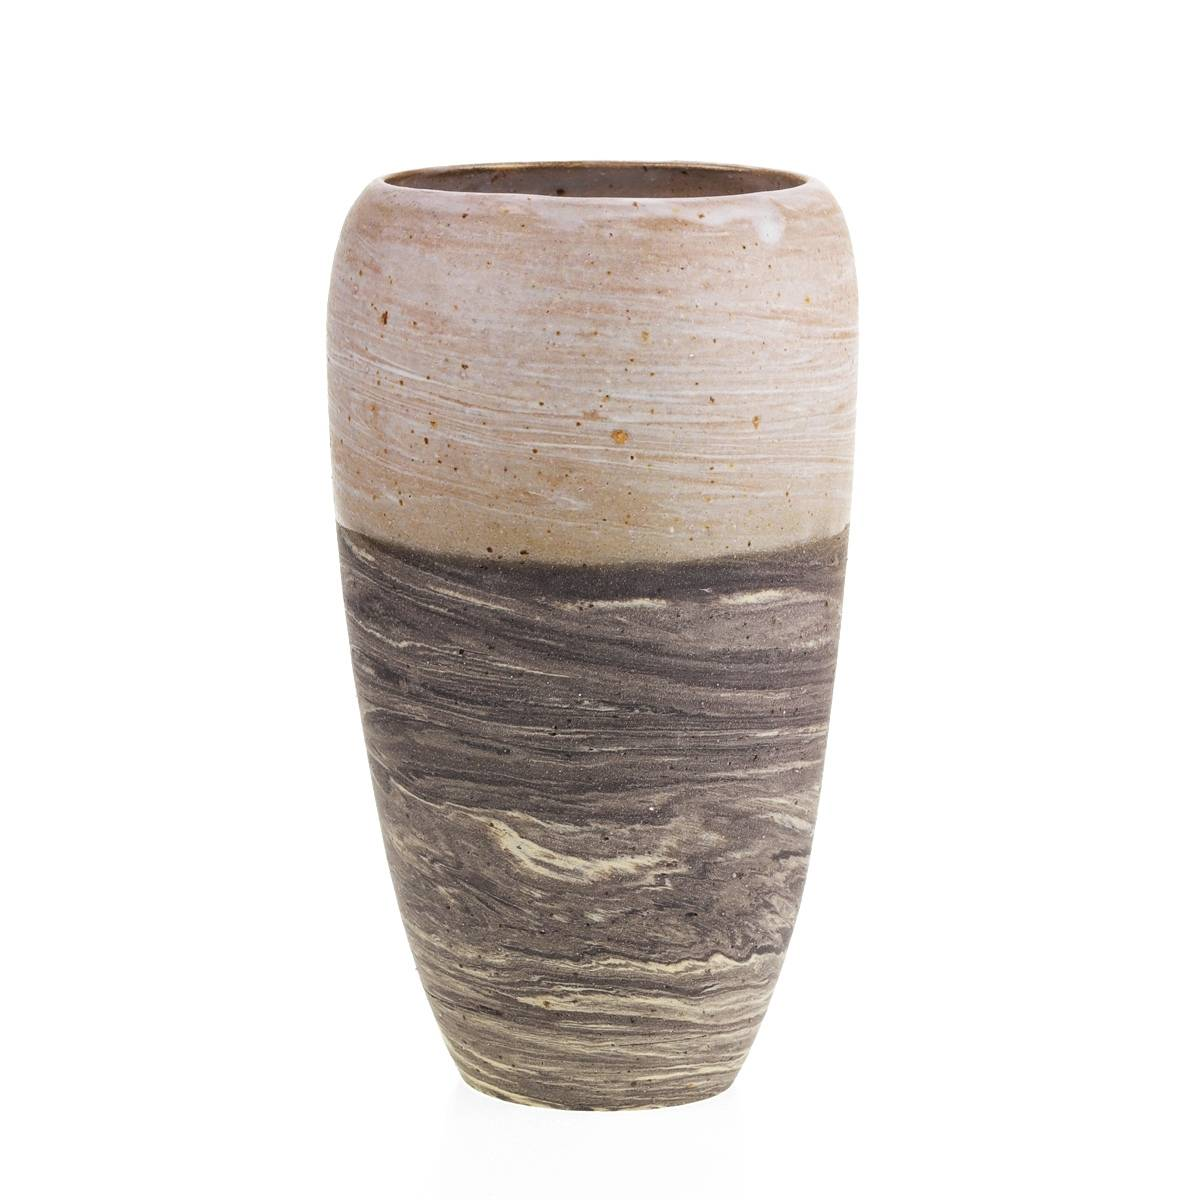 Møn-vase-no02